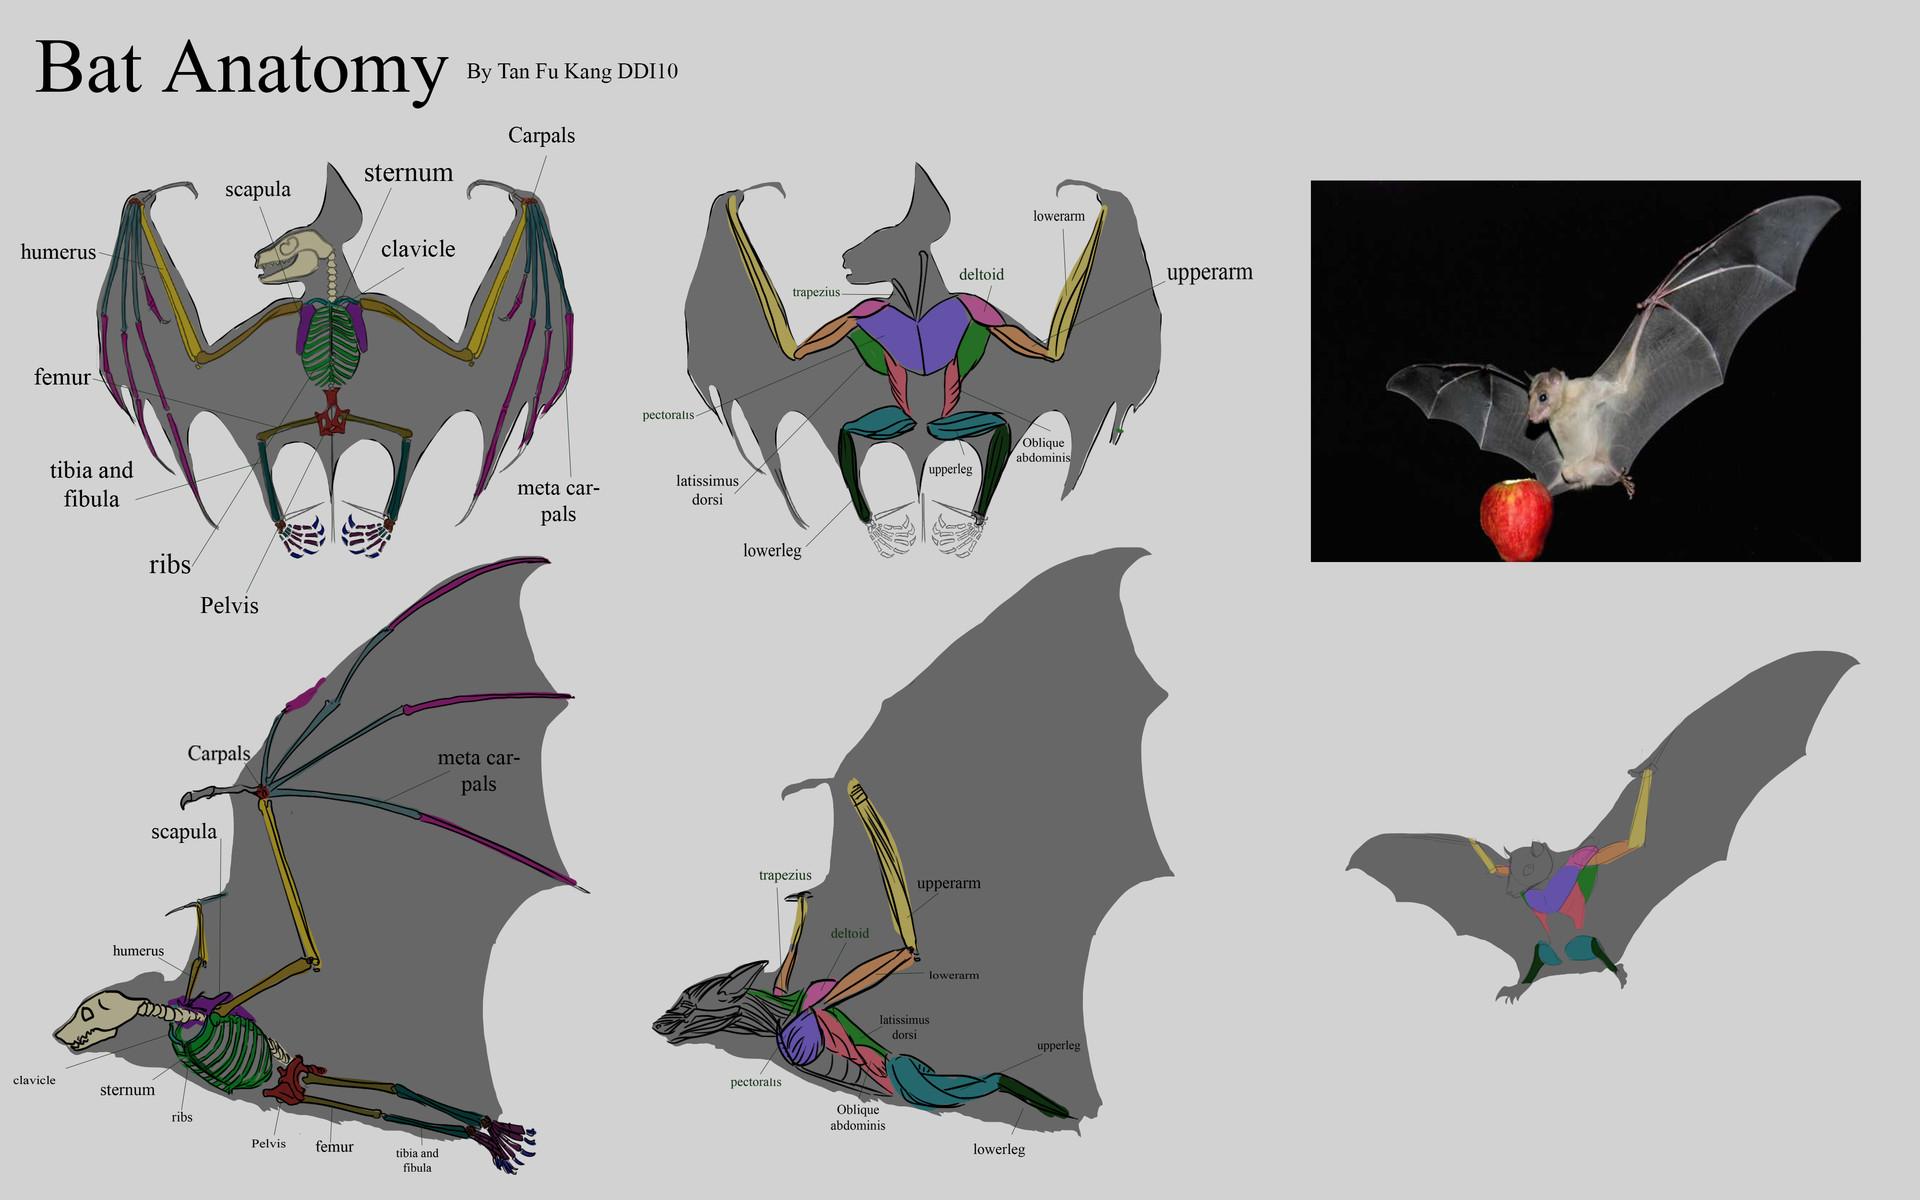 ArtStation - Creature Anatomy study, Fukang Tan